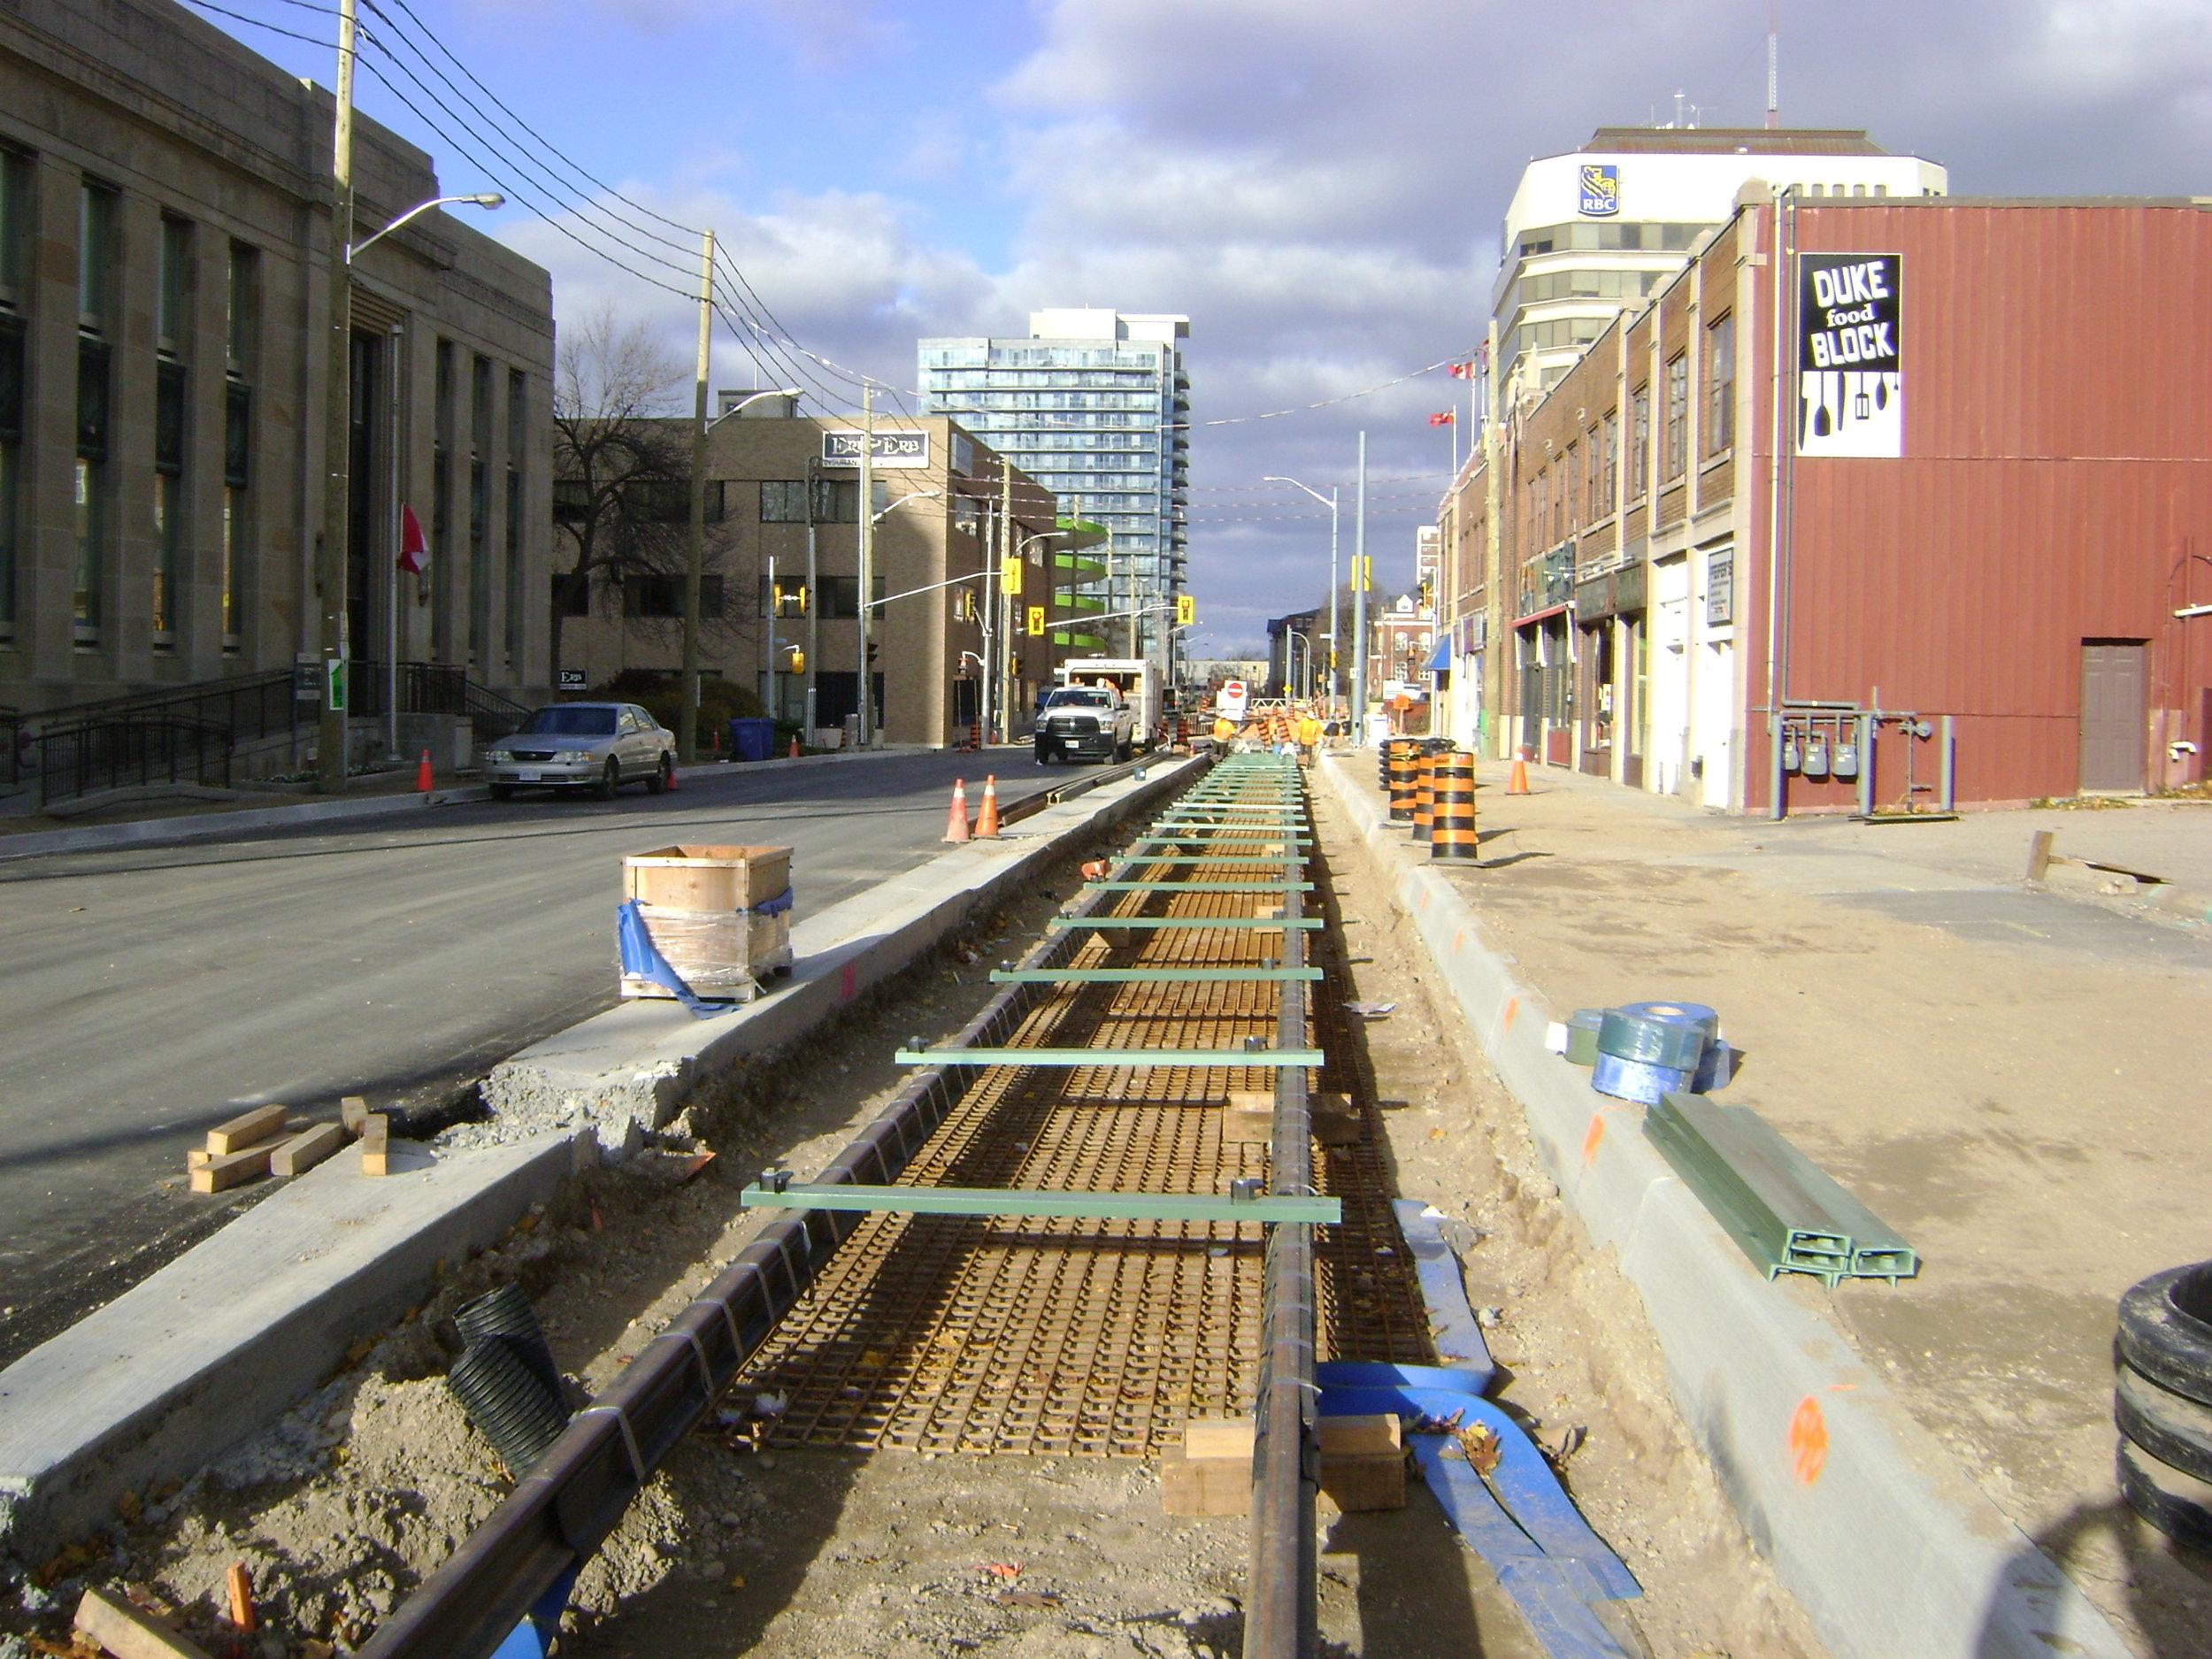 Rail is set along Duke Street.